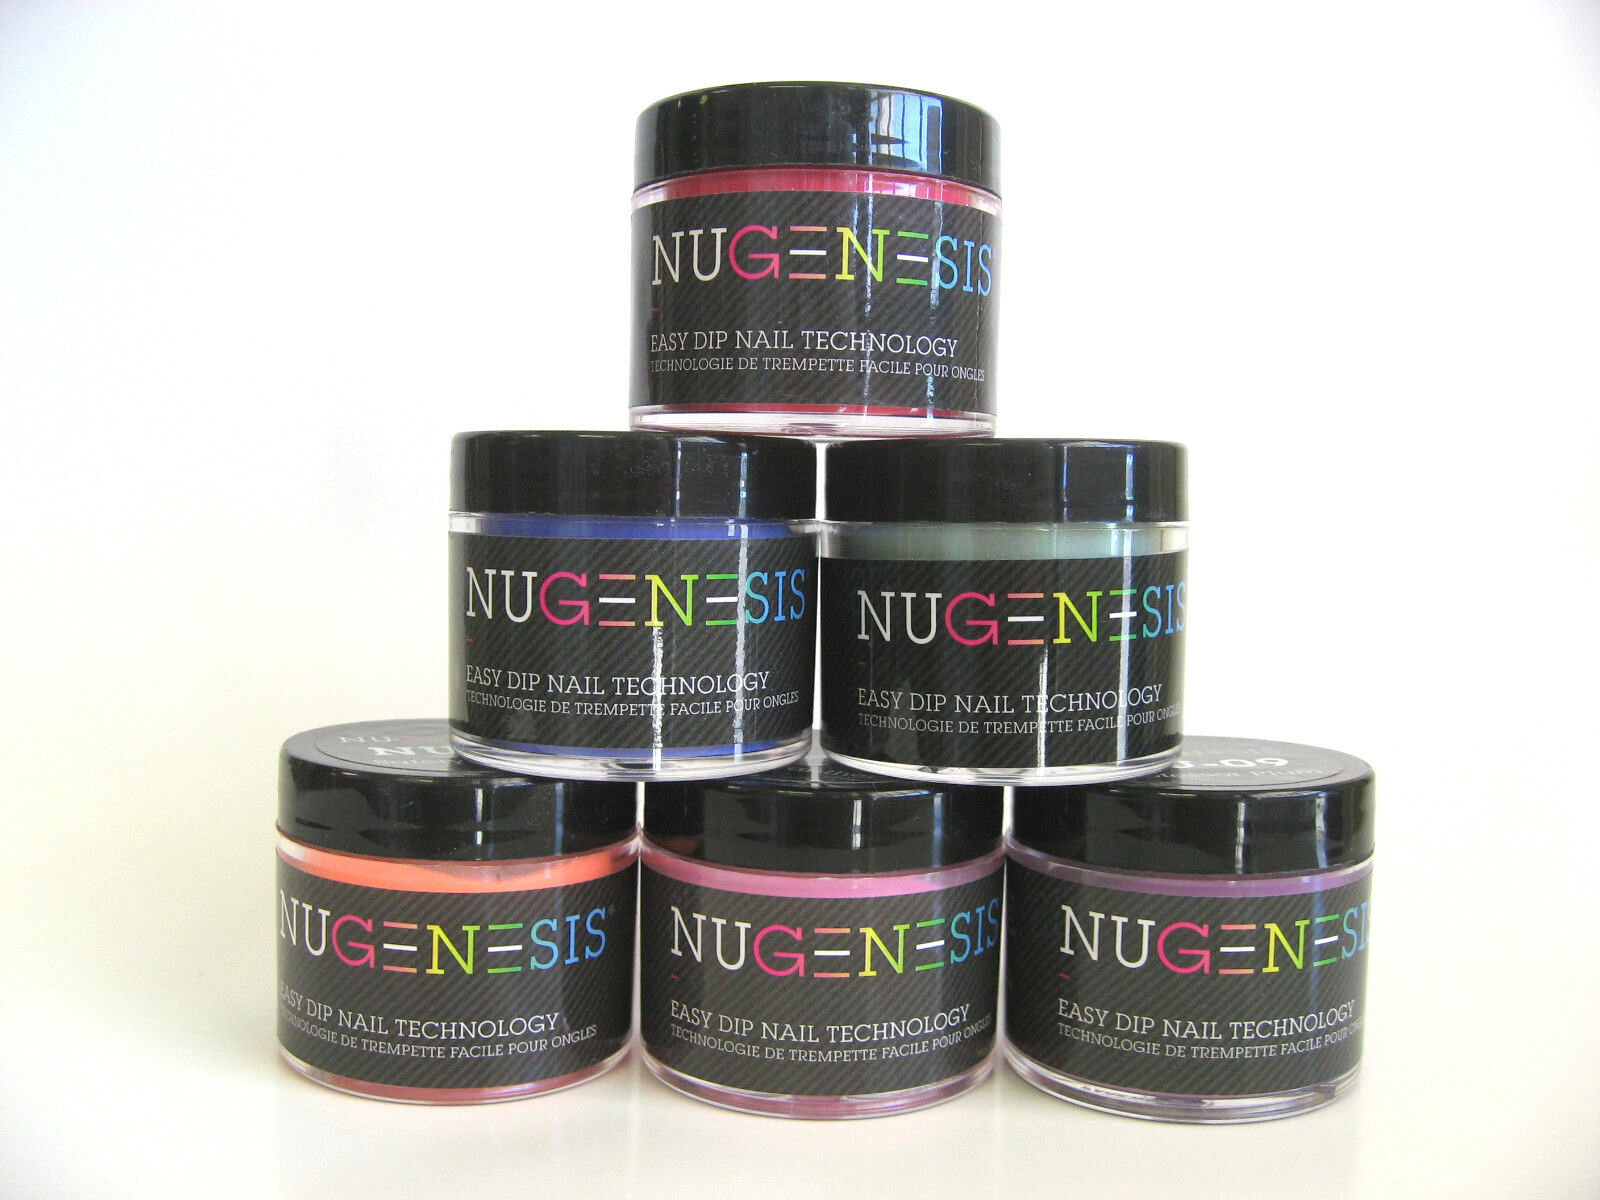 NuGenesis Easy Dip 15 oz Dipping Powder Part 2 Like SNS Get 5 off 2nd Item